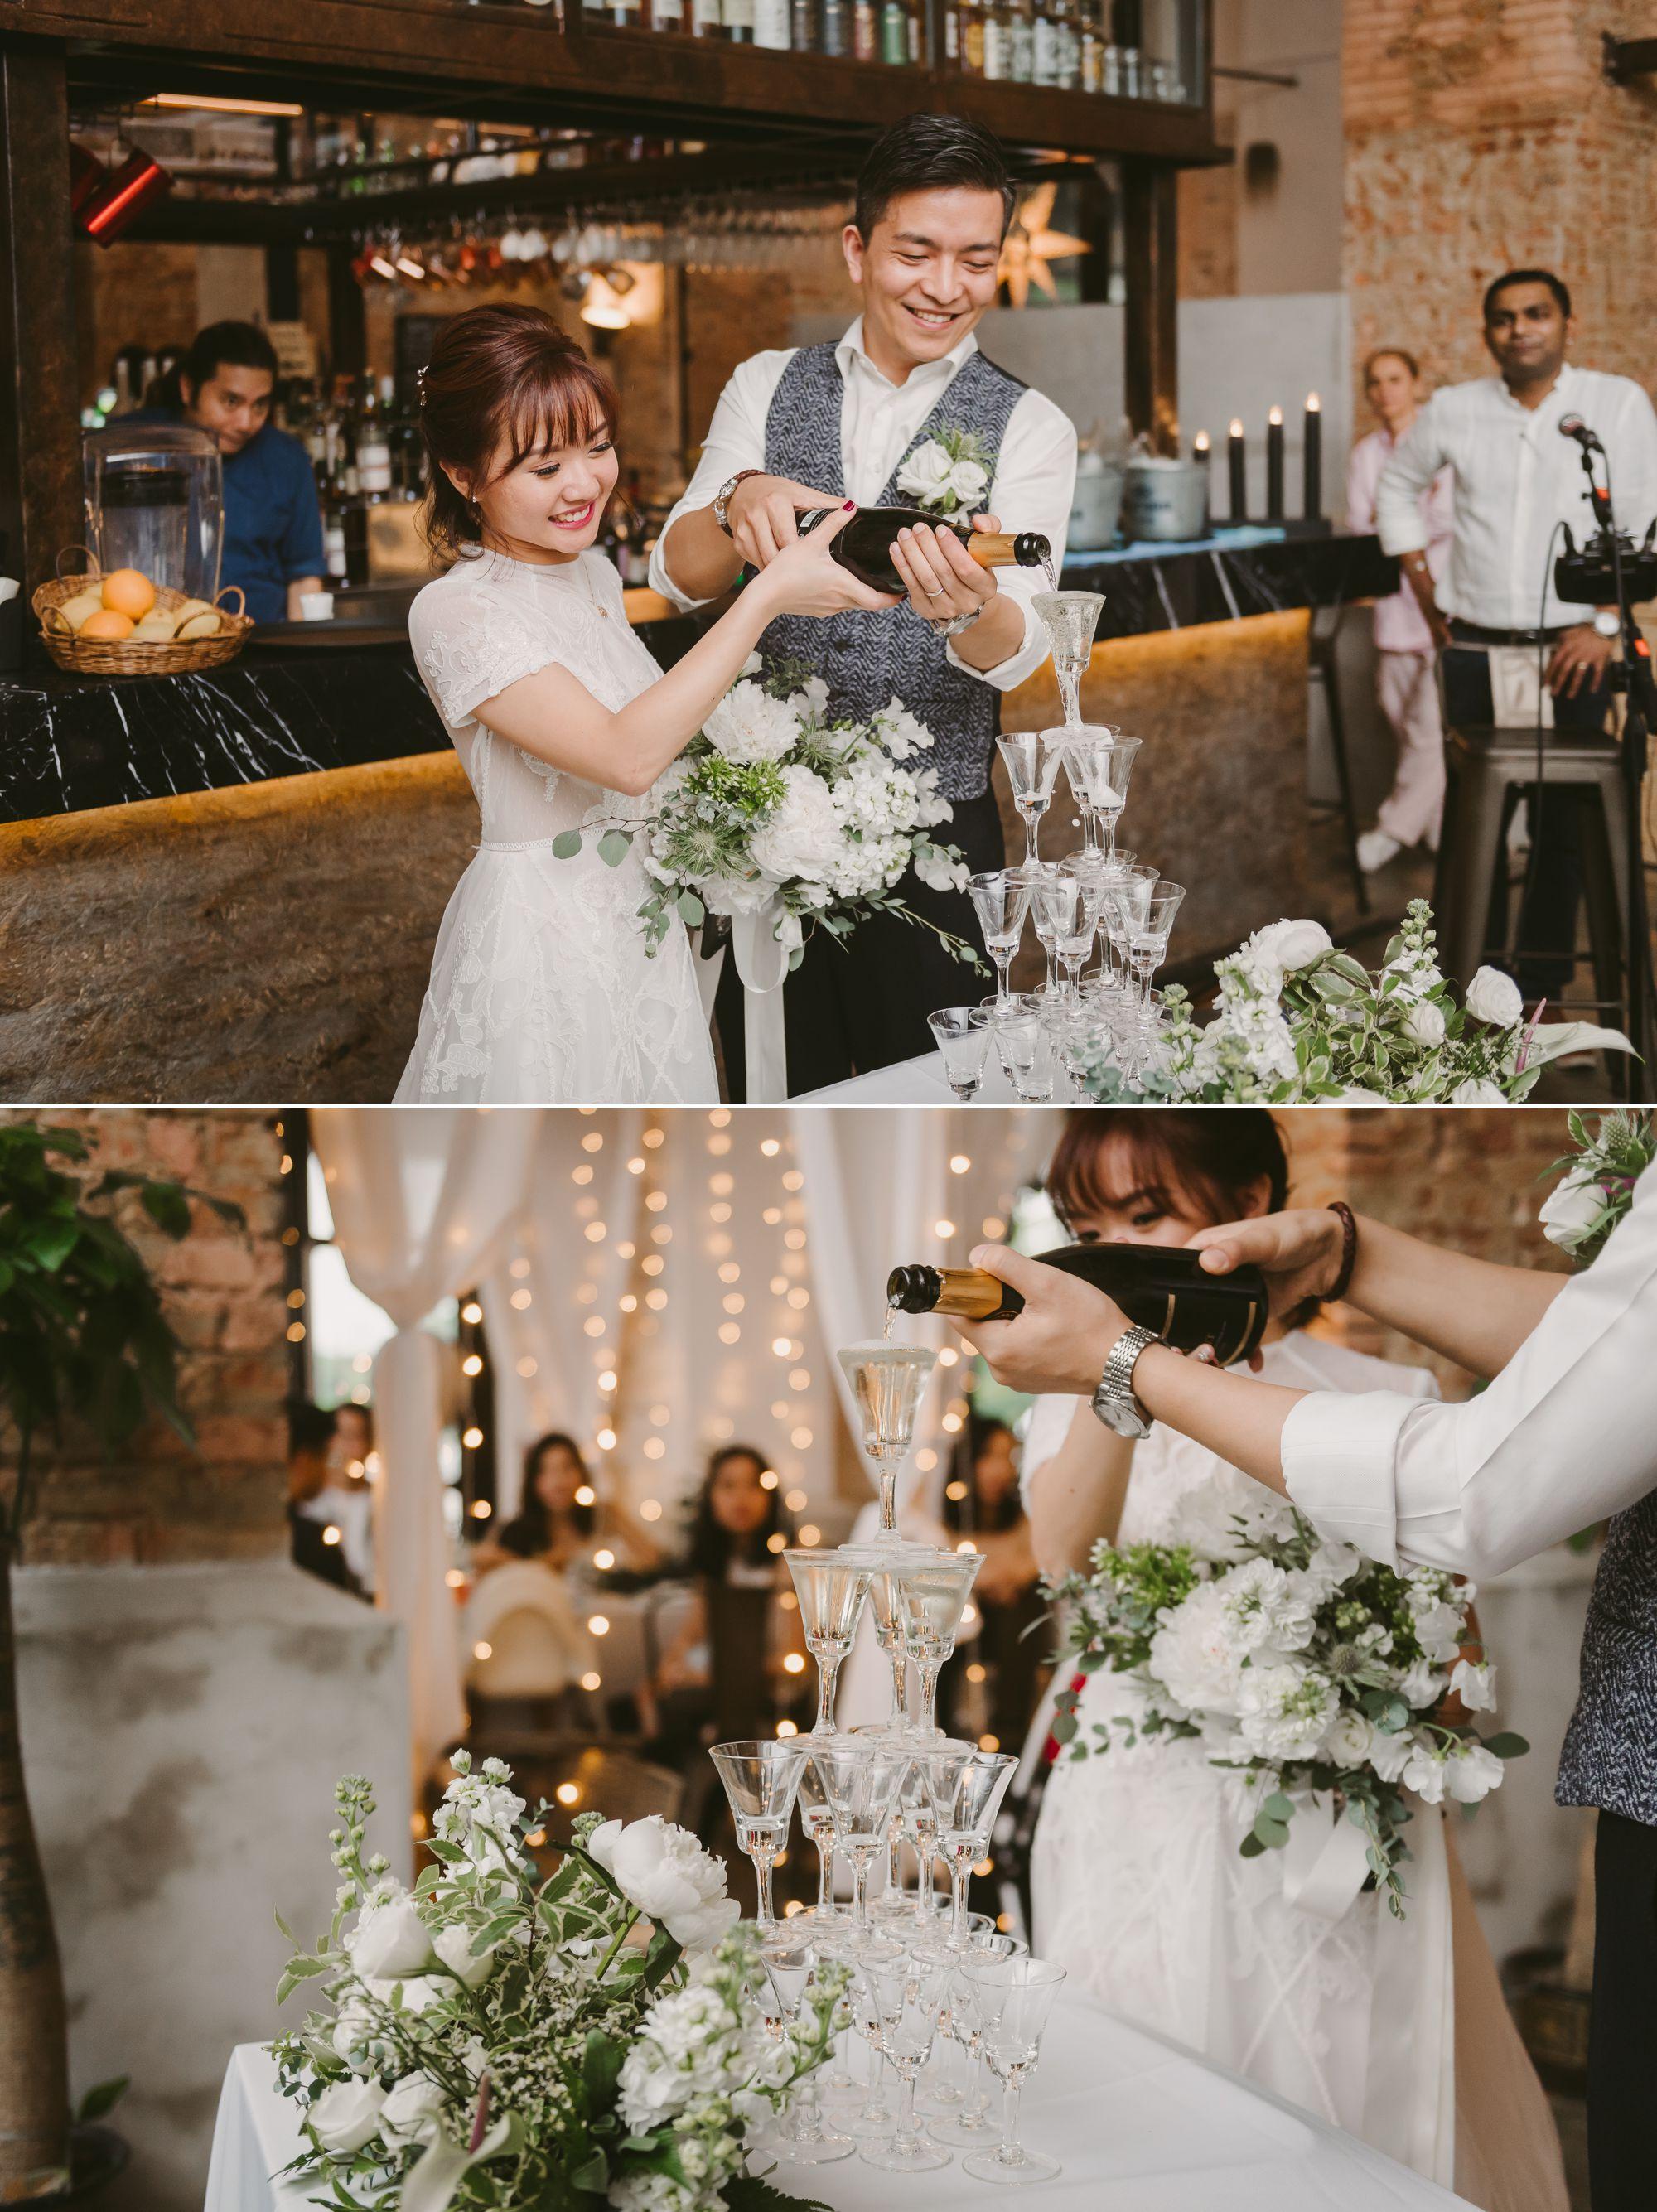 wedding_photography 29.jpg